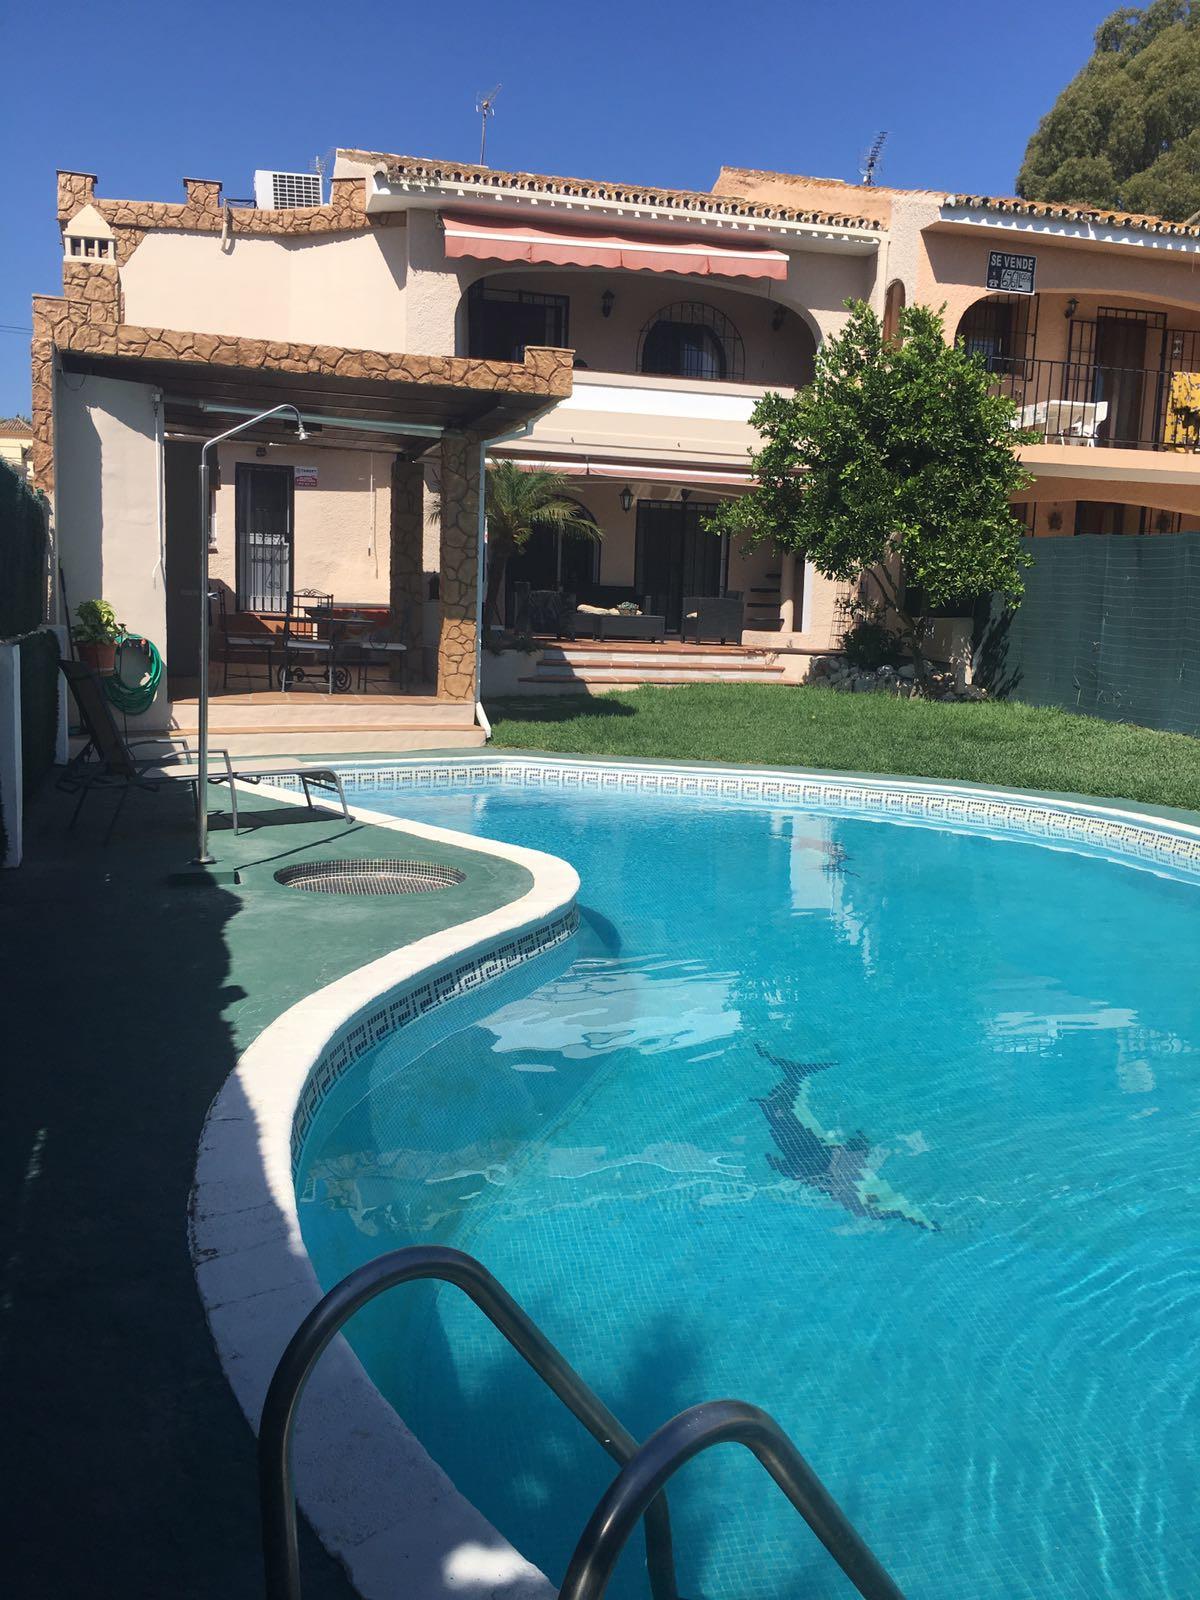 LARGE SEMI DETACHED HOUSE WITH PRIVATE GARDEN IN NUEVA ATALAYA, ESTEPONA. For sale, spacious semi-de,Spain